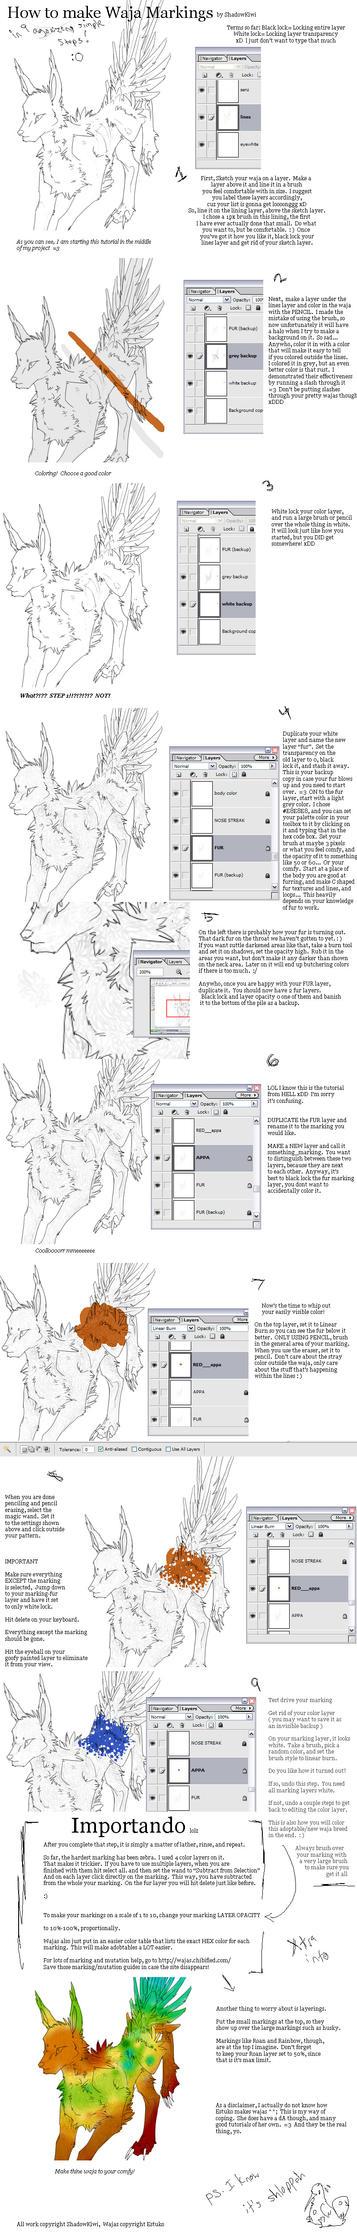 How to Make Waja Markings by ShadowKiwi